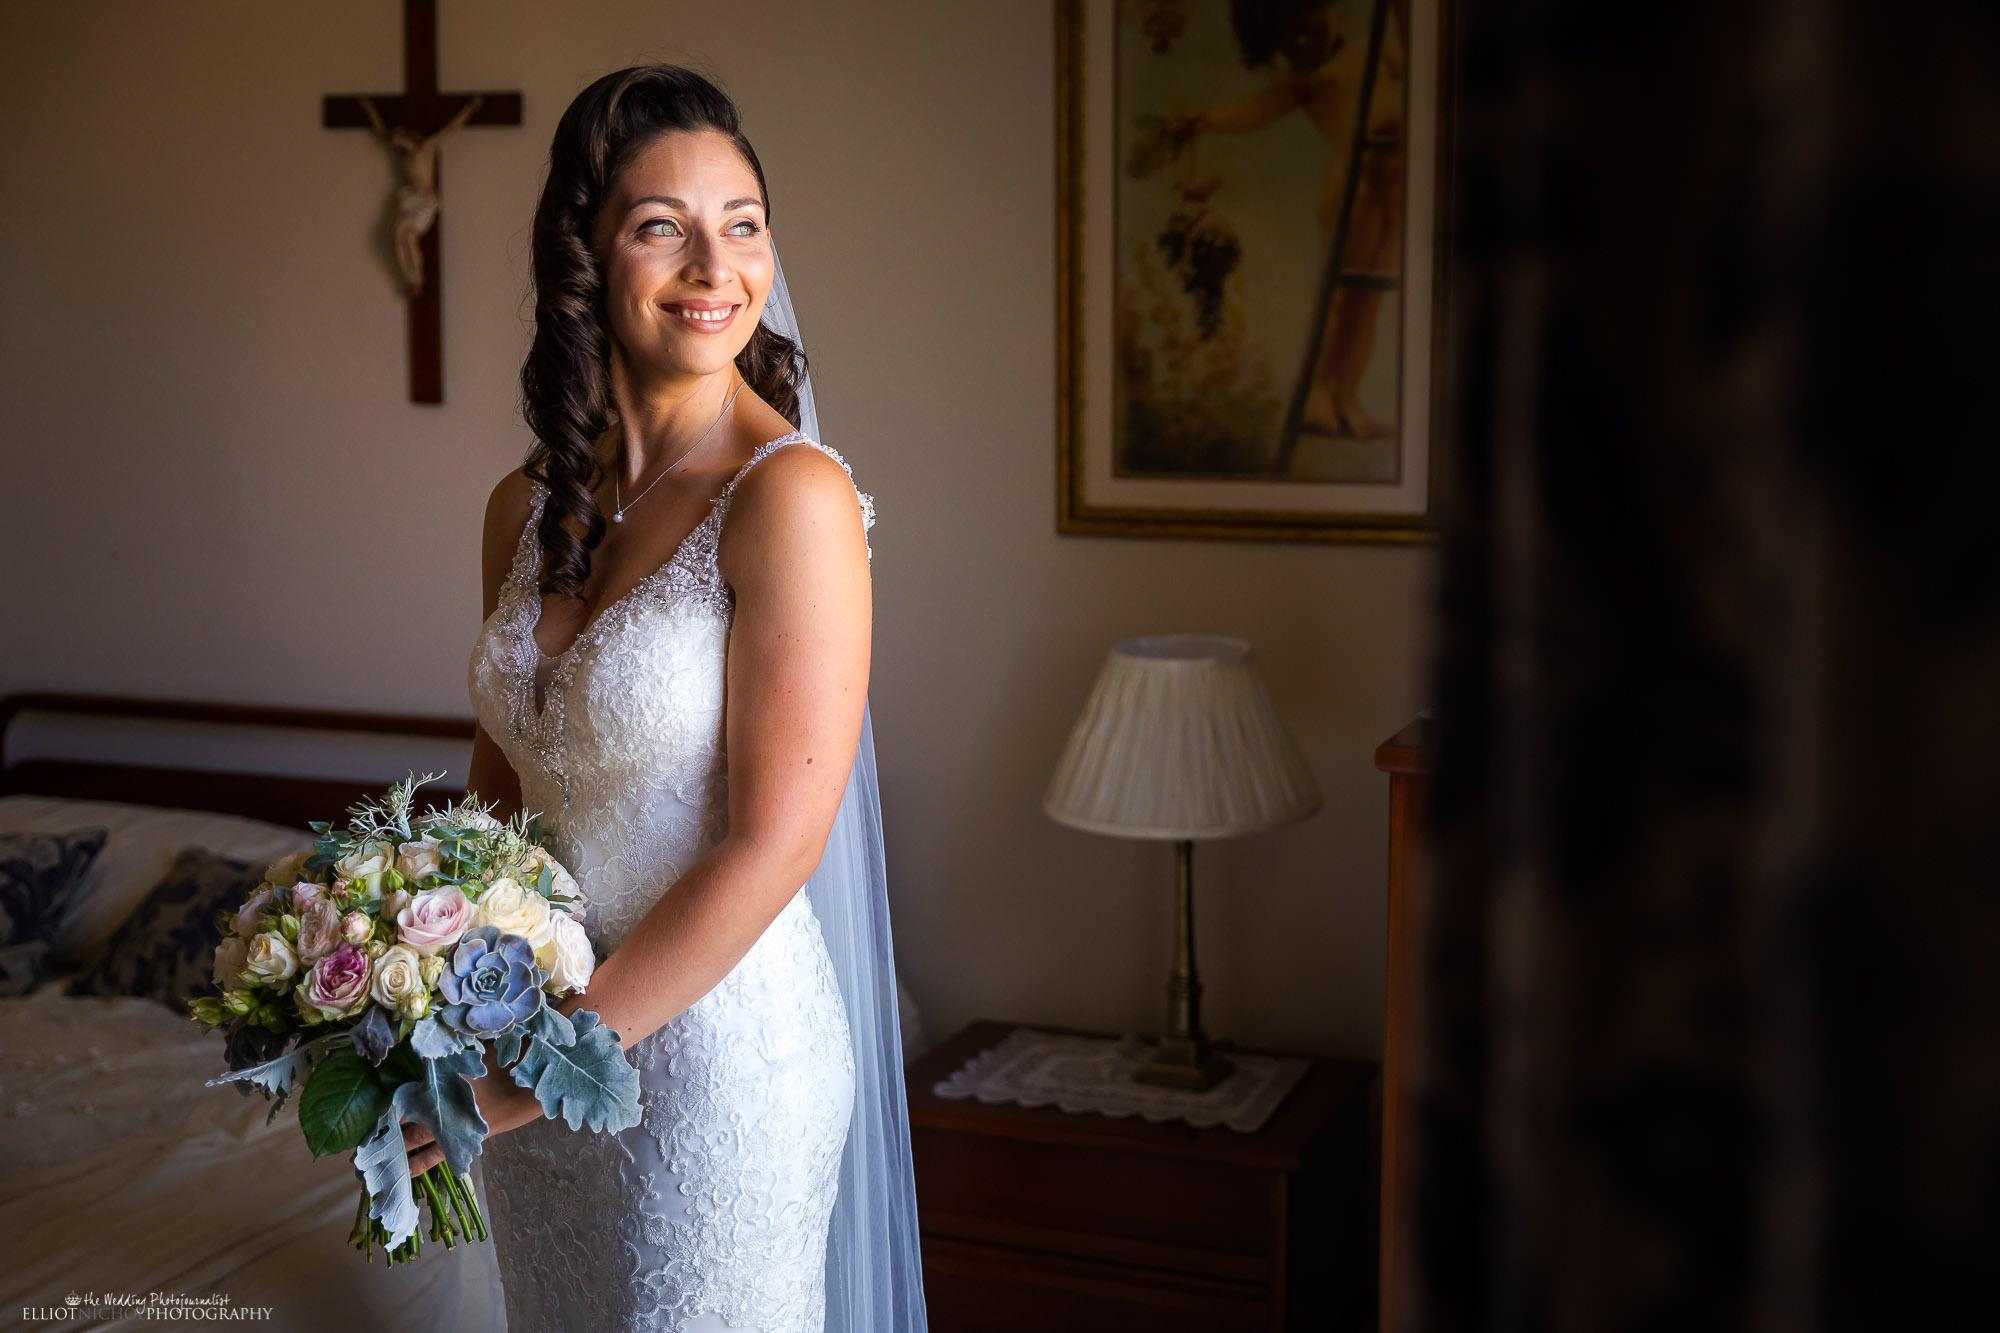 bride-wedding-photography-weddings-destination